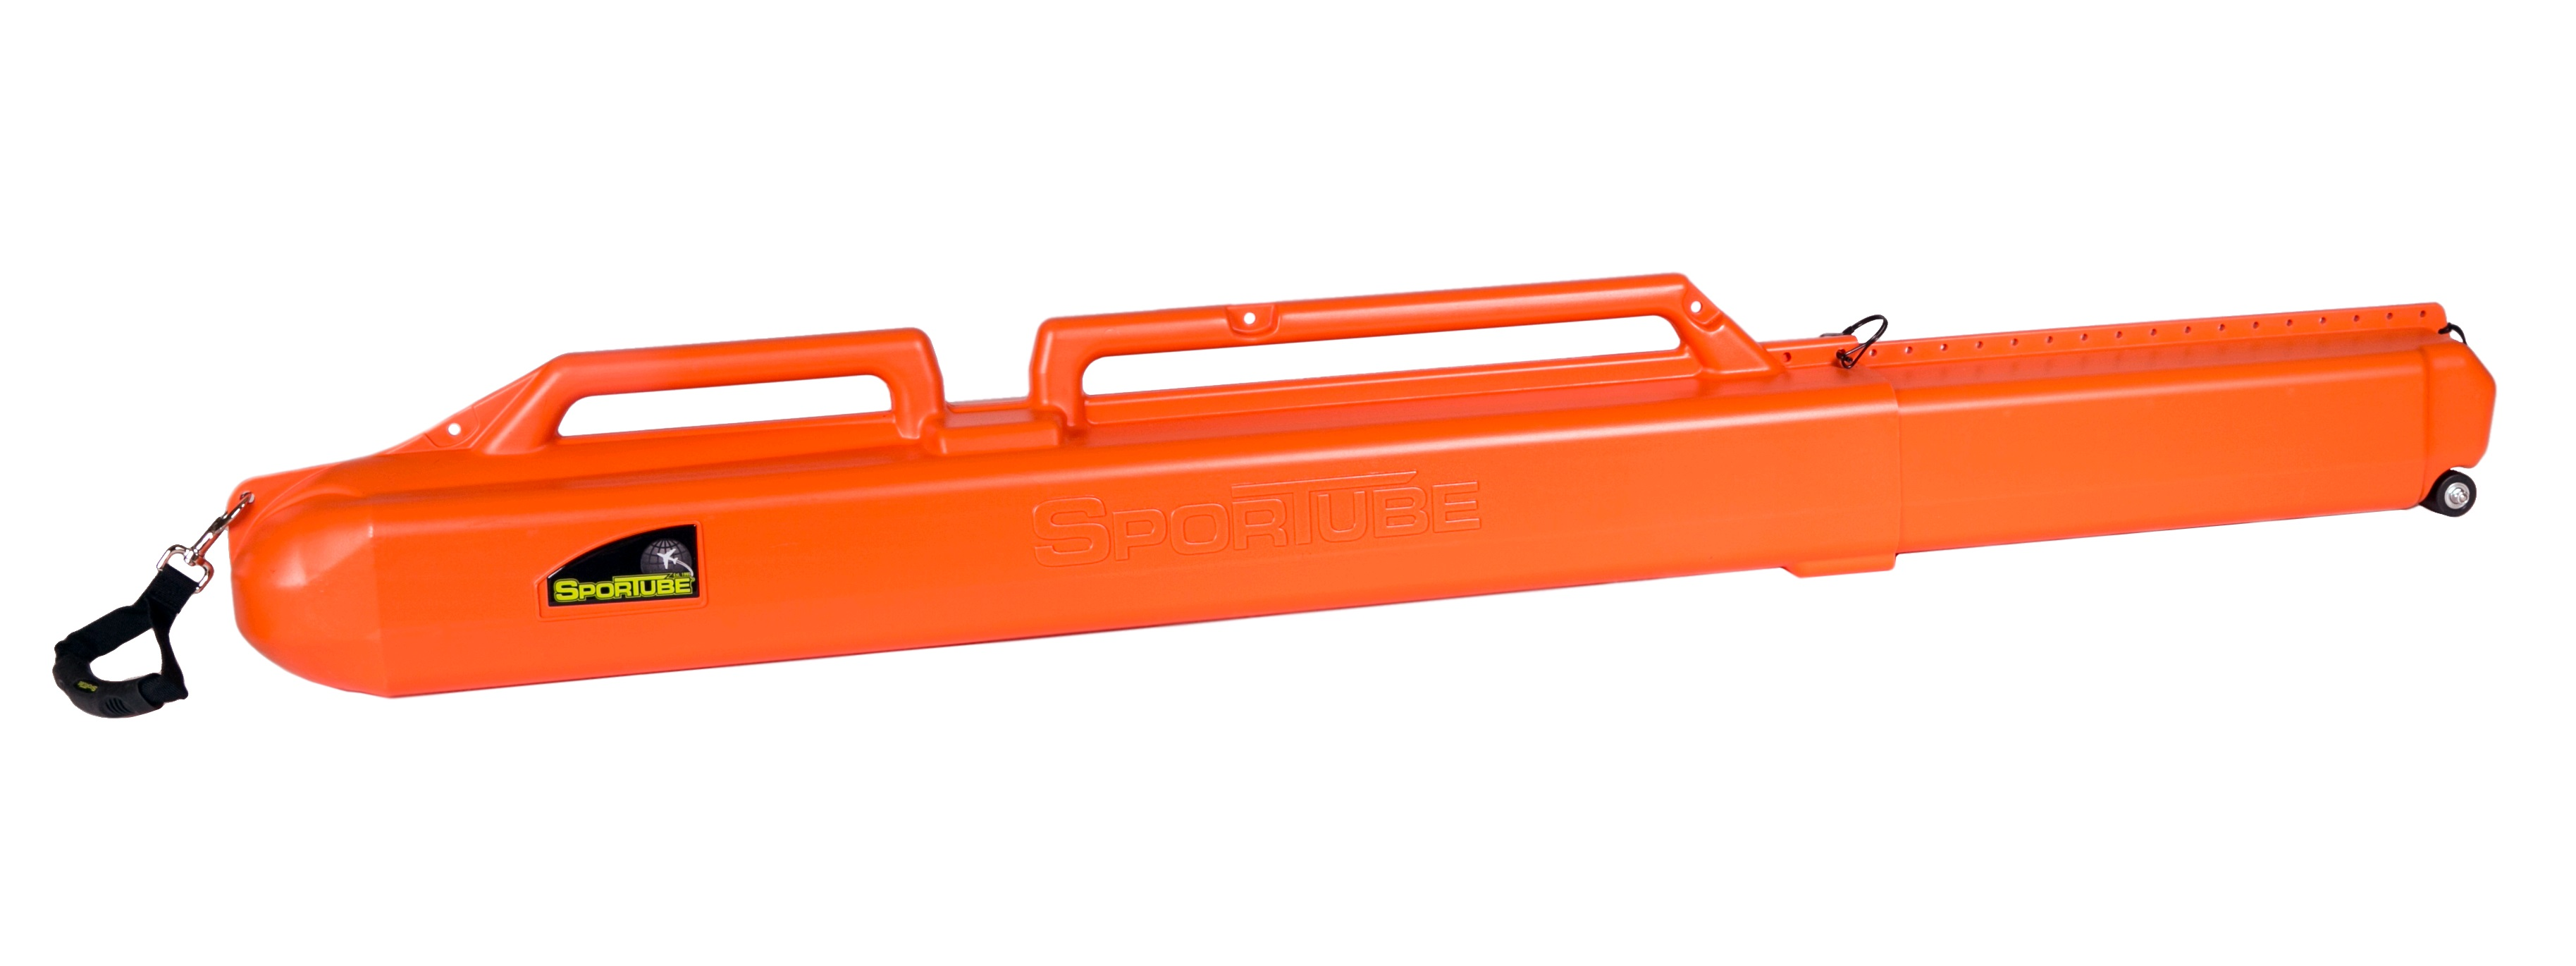 Sportube Blaze Orange Rod Tubes Glasgow Angling Centre